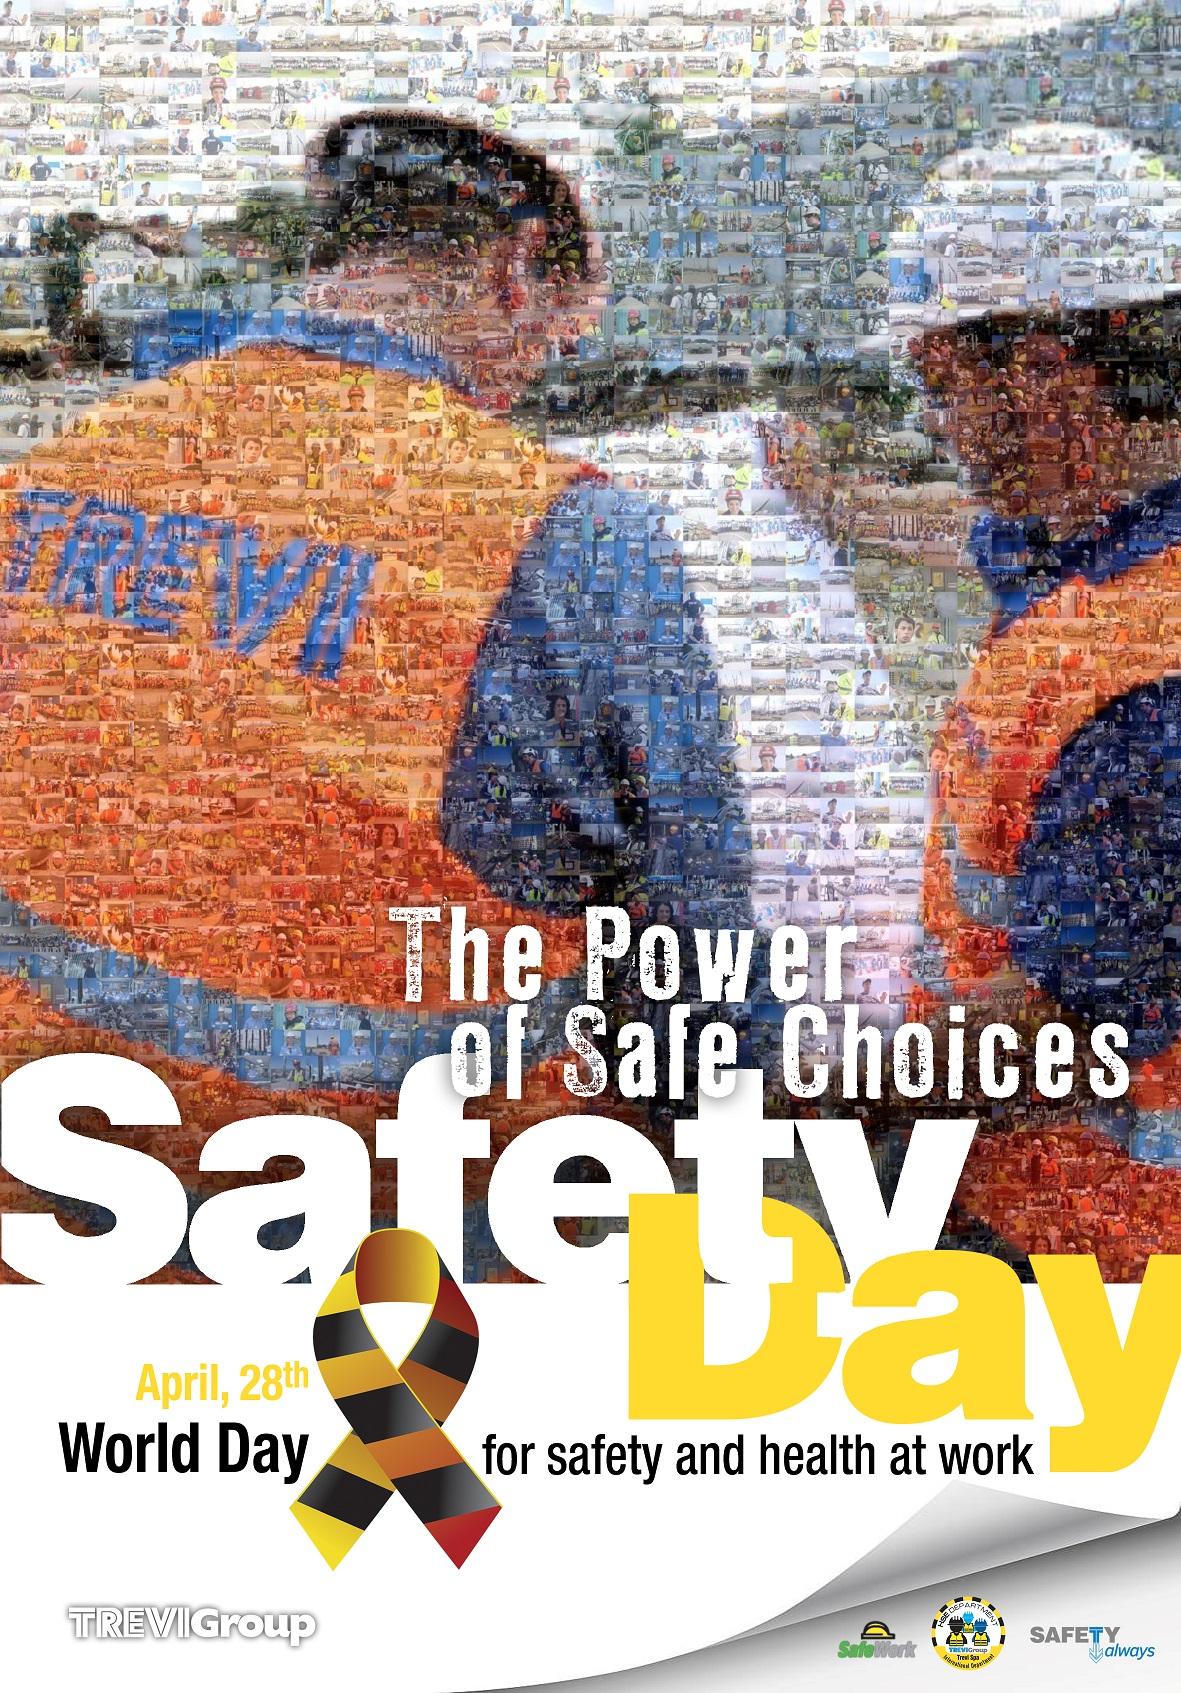 http://www.fondlhs.org/wp-content/uploads/2018/04/SafetyDay-ok_2018-1.jpg